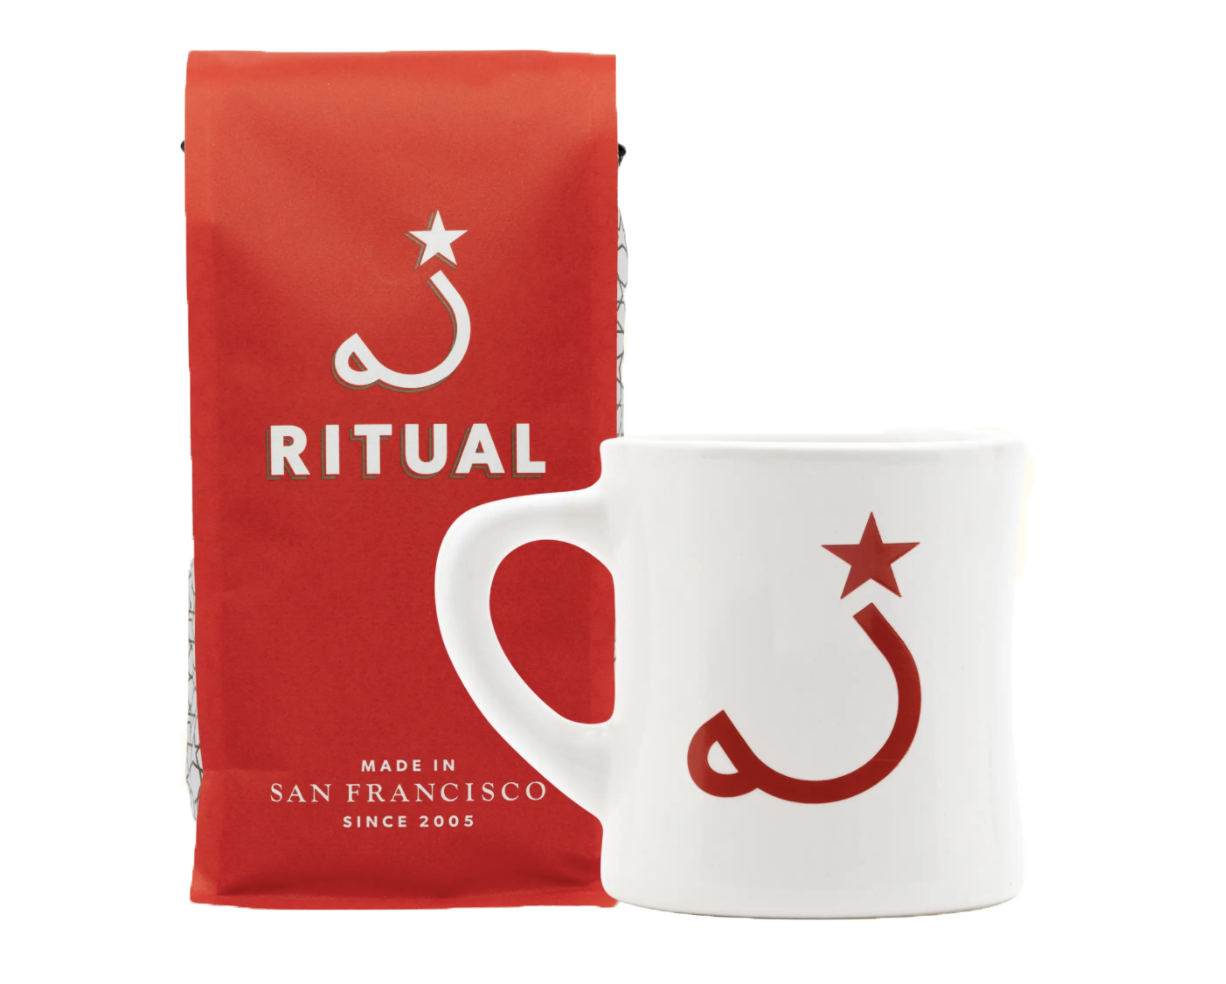 ritual-coffee-gift-set.png